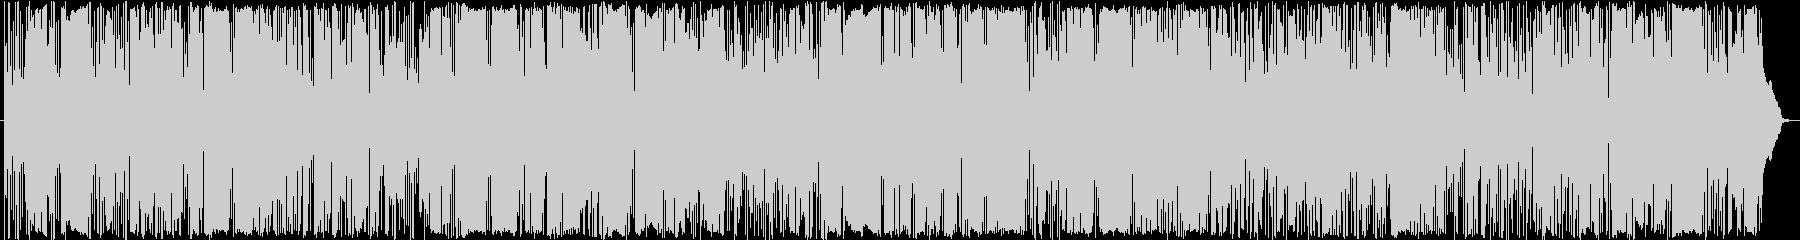 Trumpet Norinori Summer Latin Salsa's unreproduced waveform